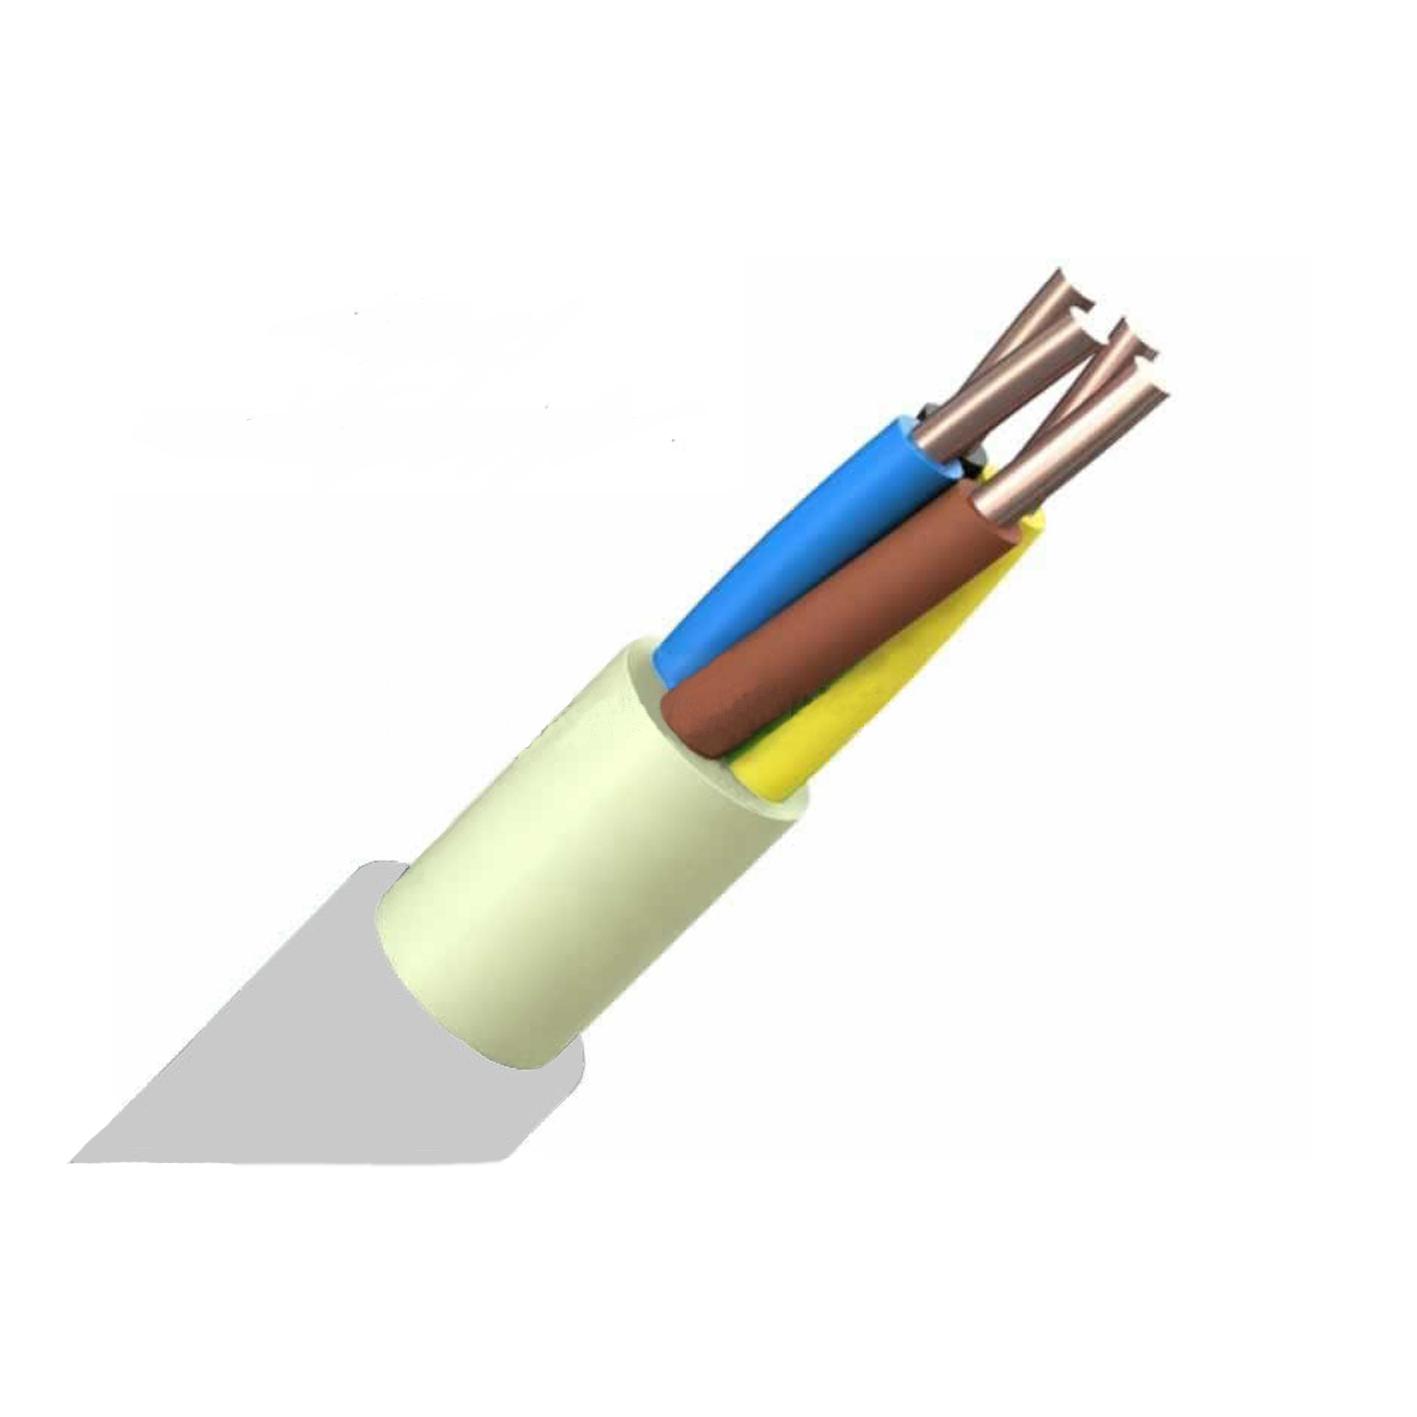 Öznur 3x1.5 NYM (NVV) Kablo